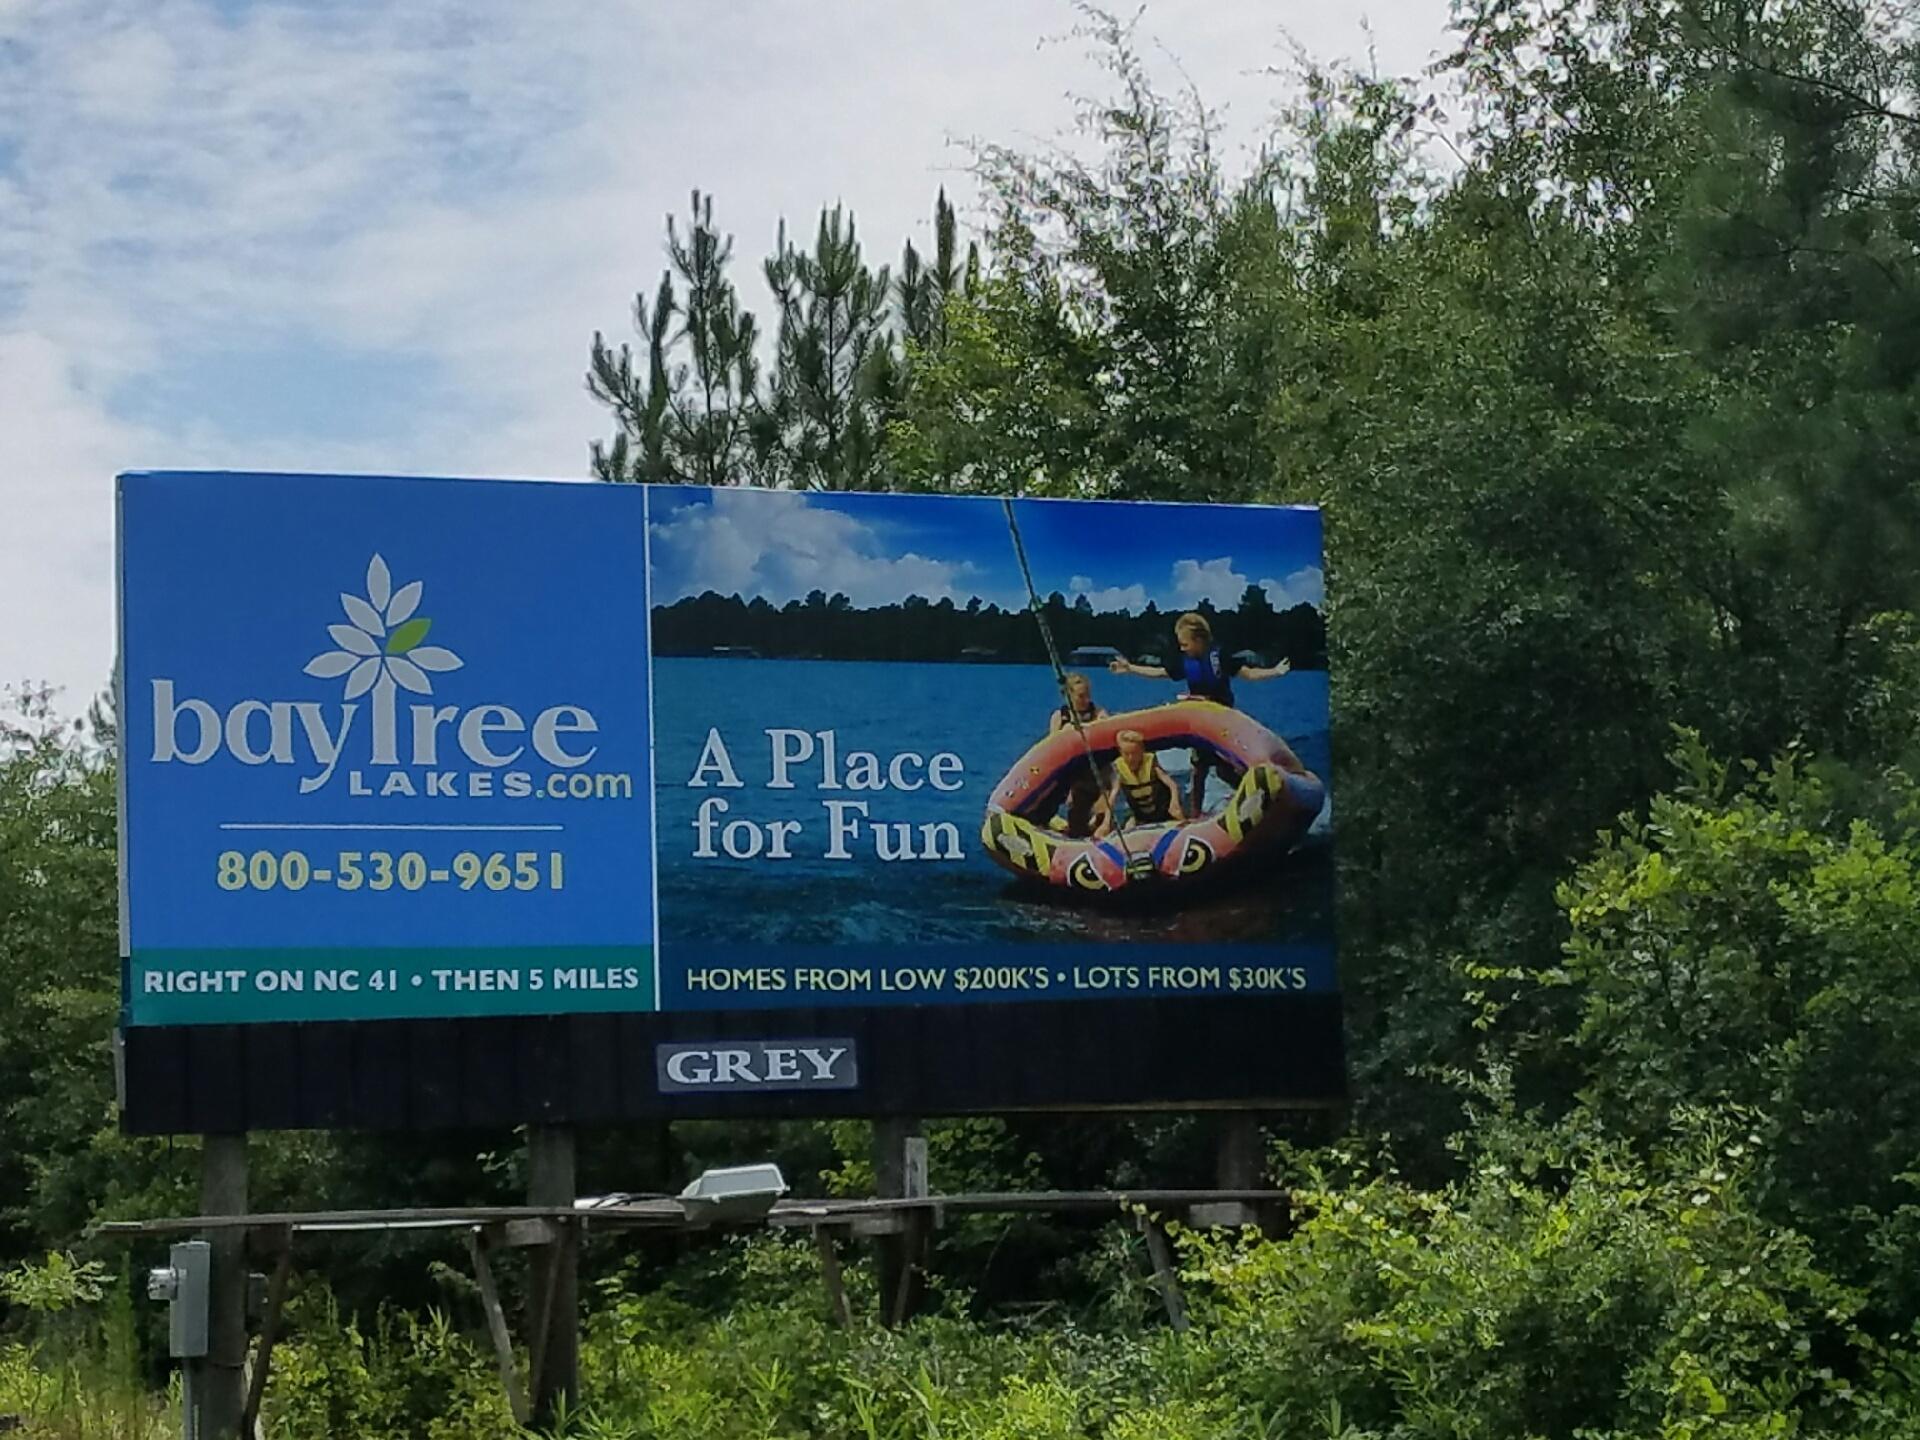 bay tree lakes billboard